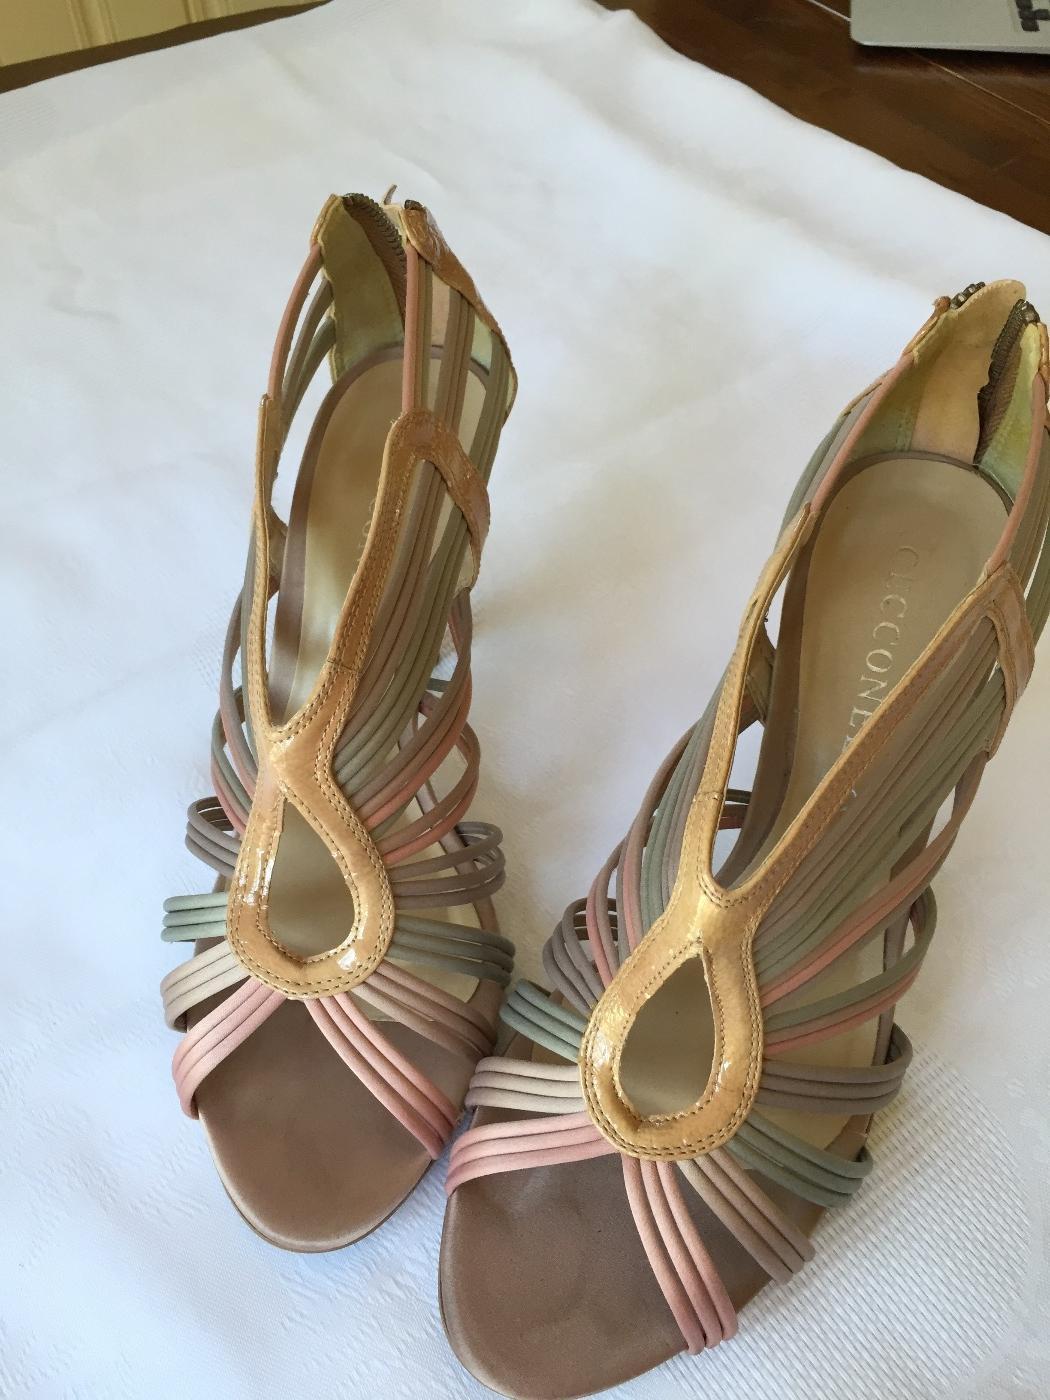 d98337311 Best Cecconello Shoes Size 38 (europe) for sale in Dollard-Des Ormeaux